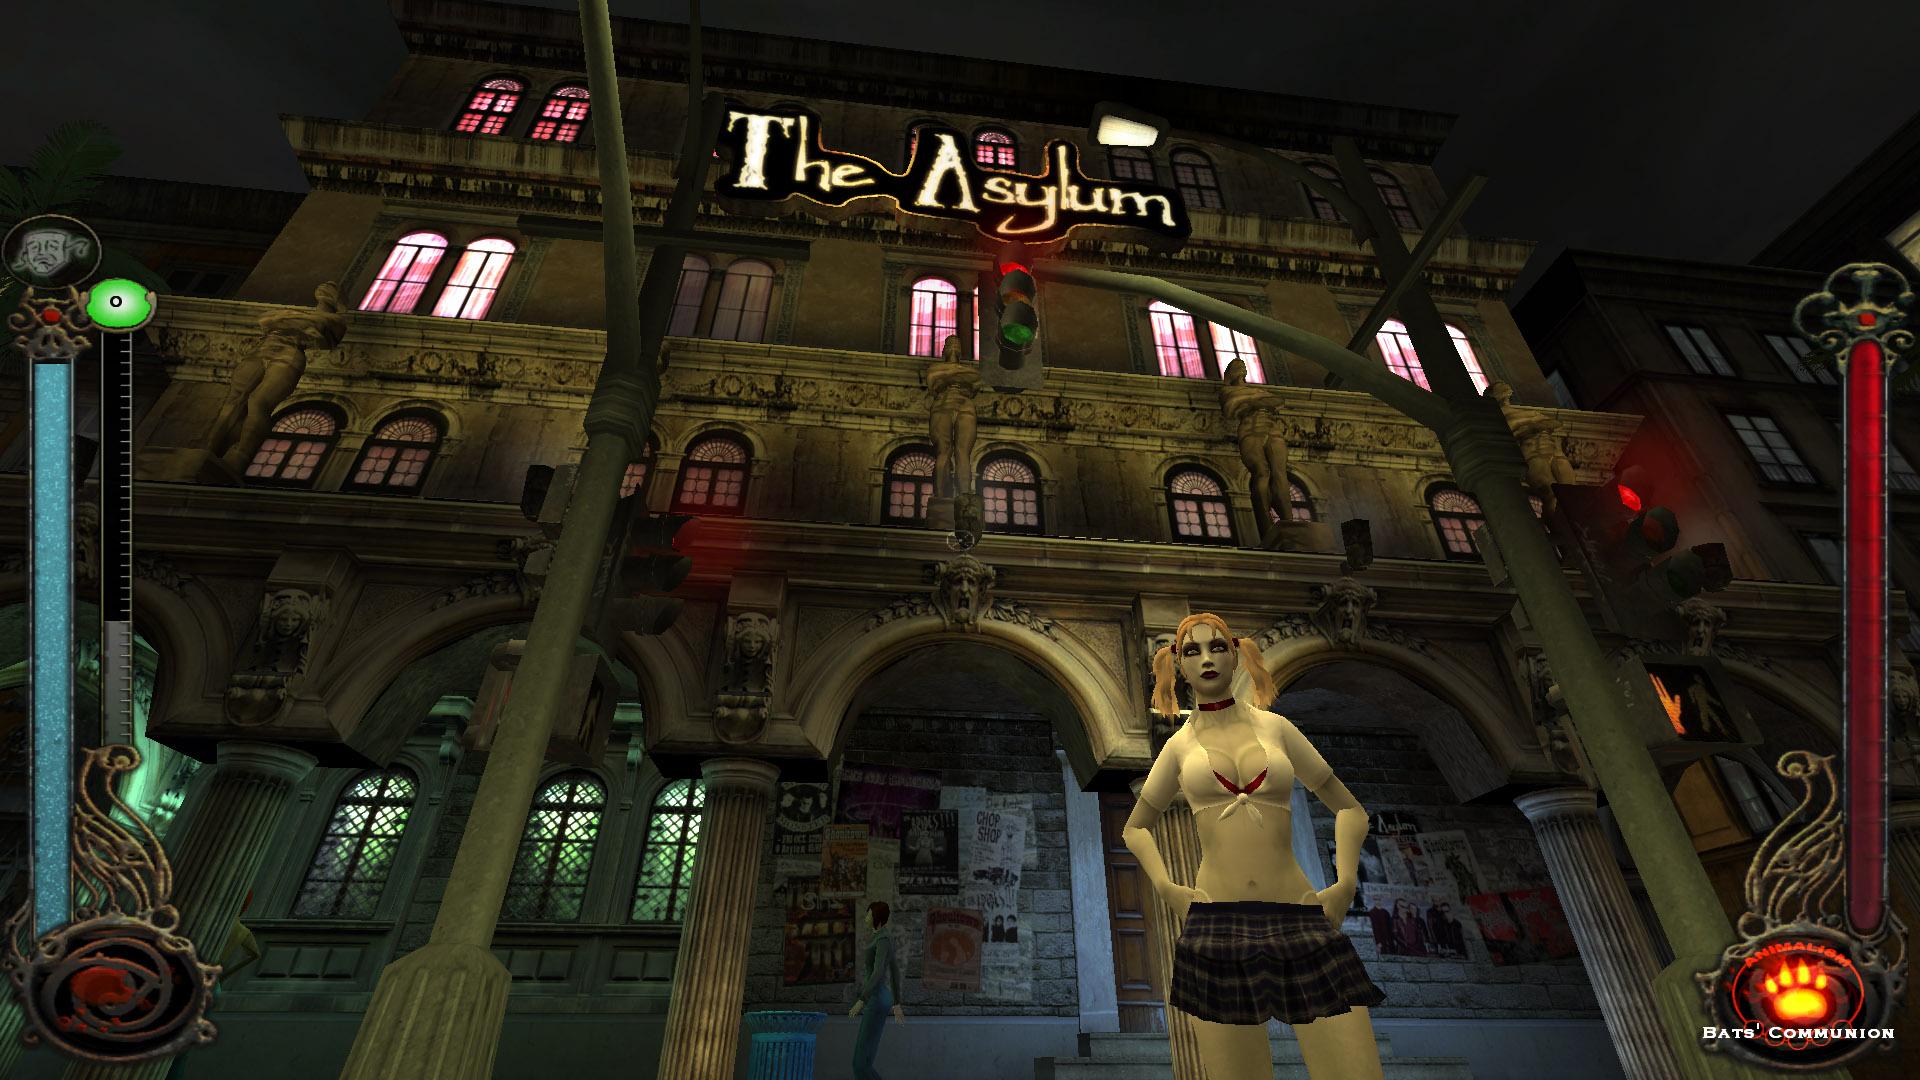 Asylum Image Collide Soundtrack Mod For Vampire The Masquerade